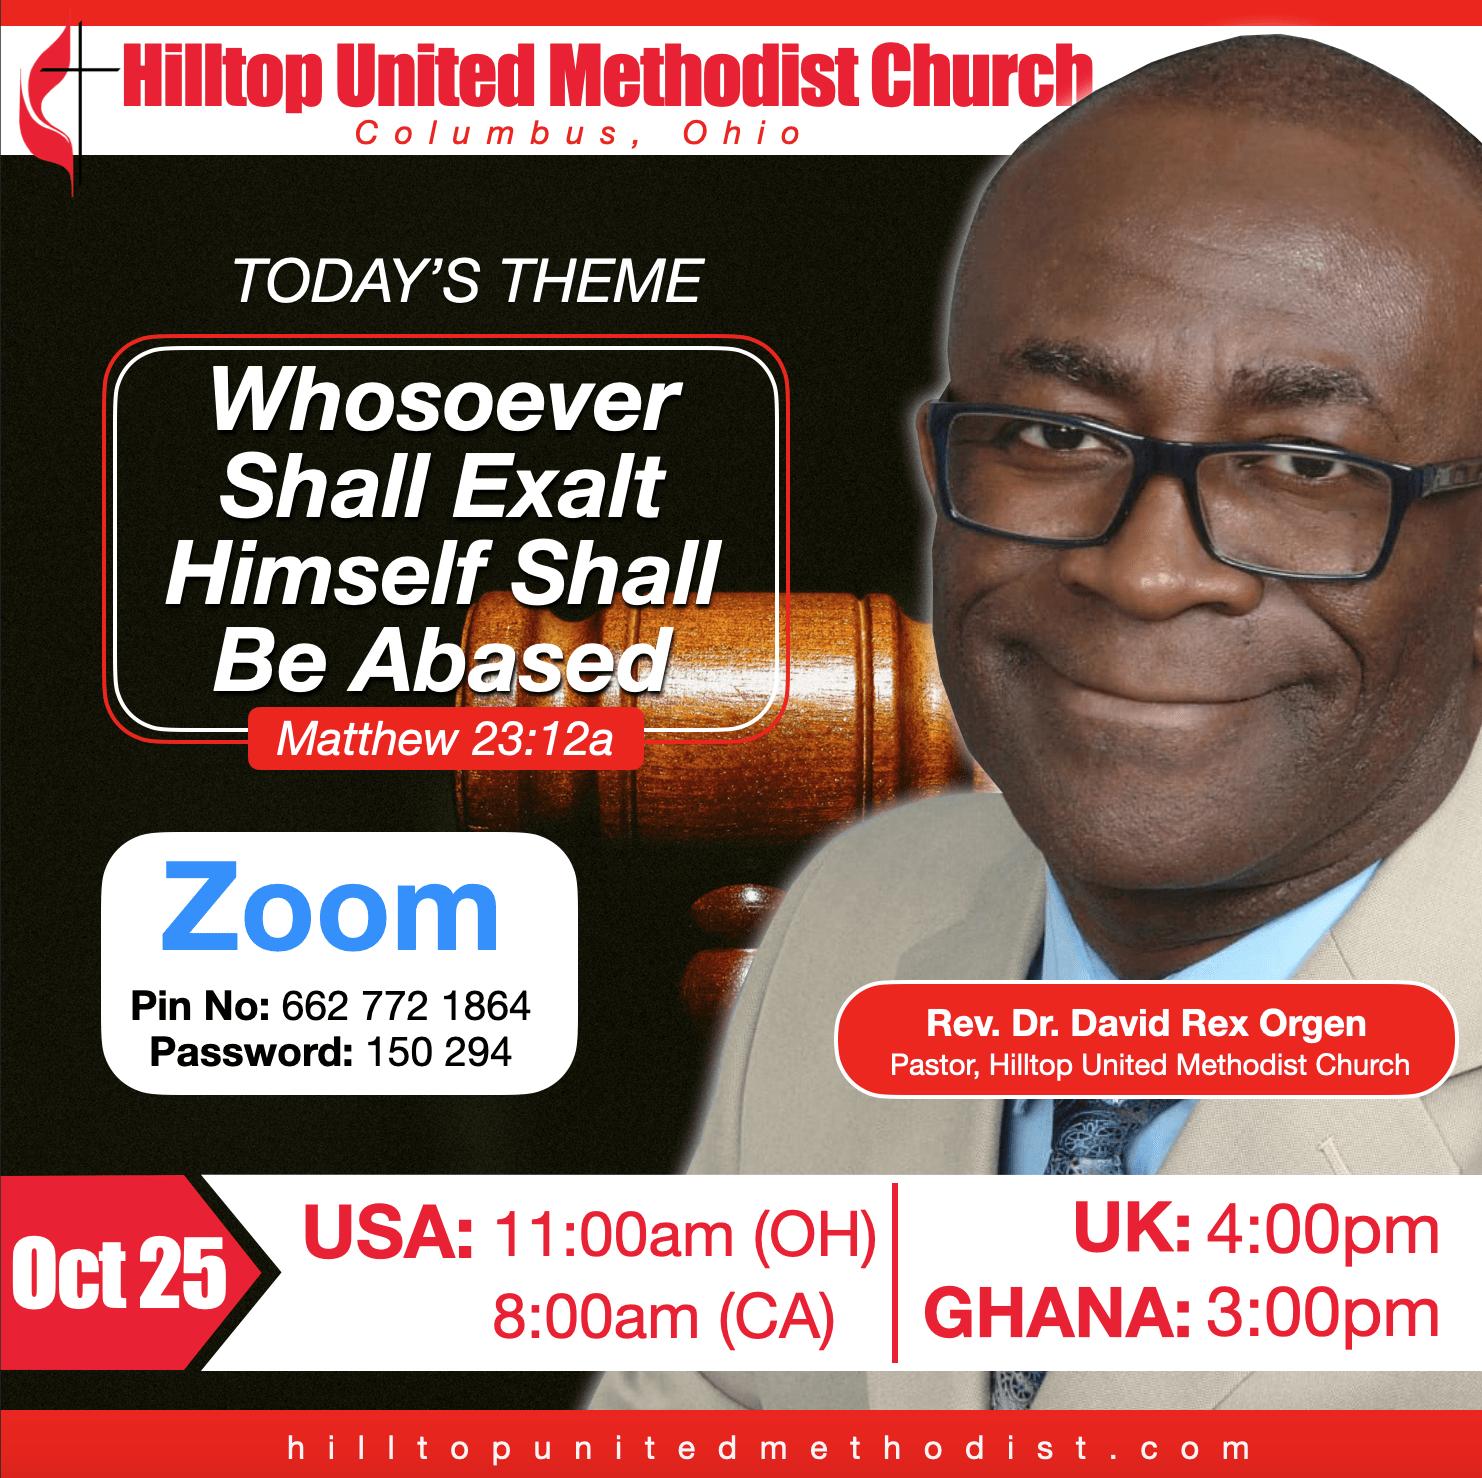 Theme: Whosoever shall exalt Himself shall be Abased